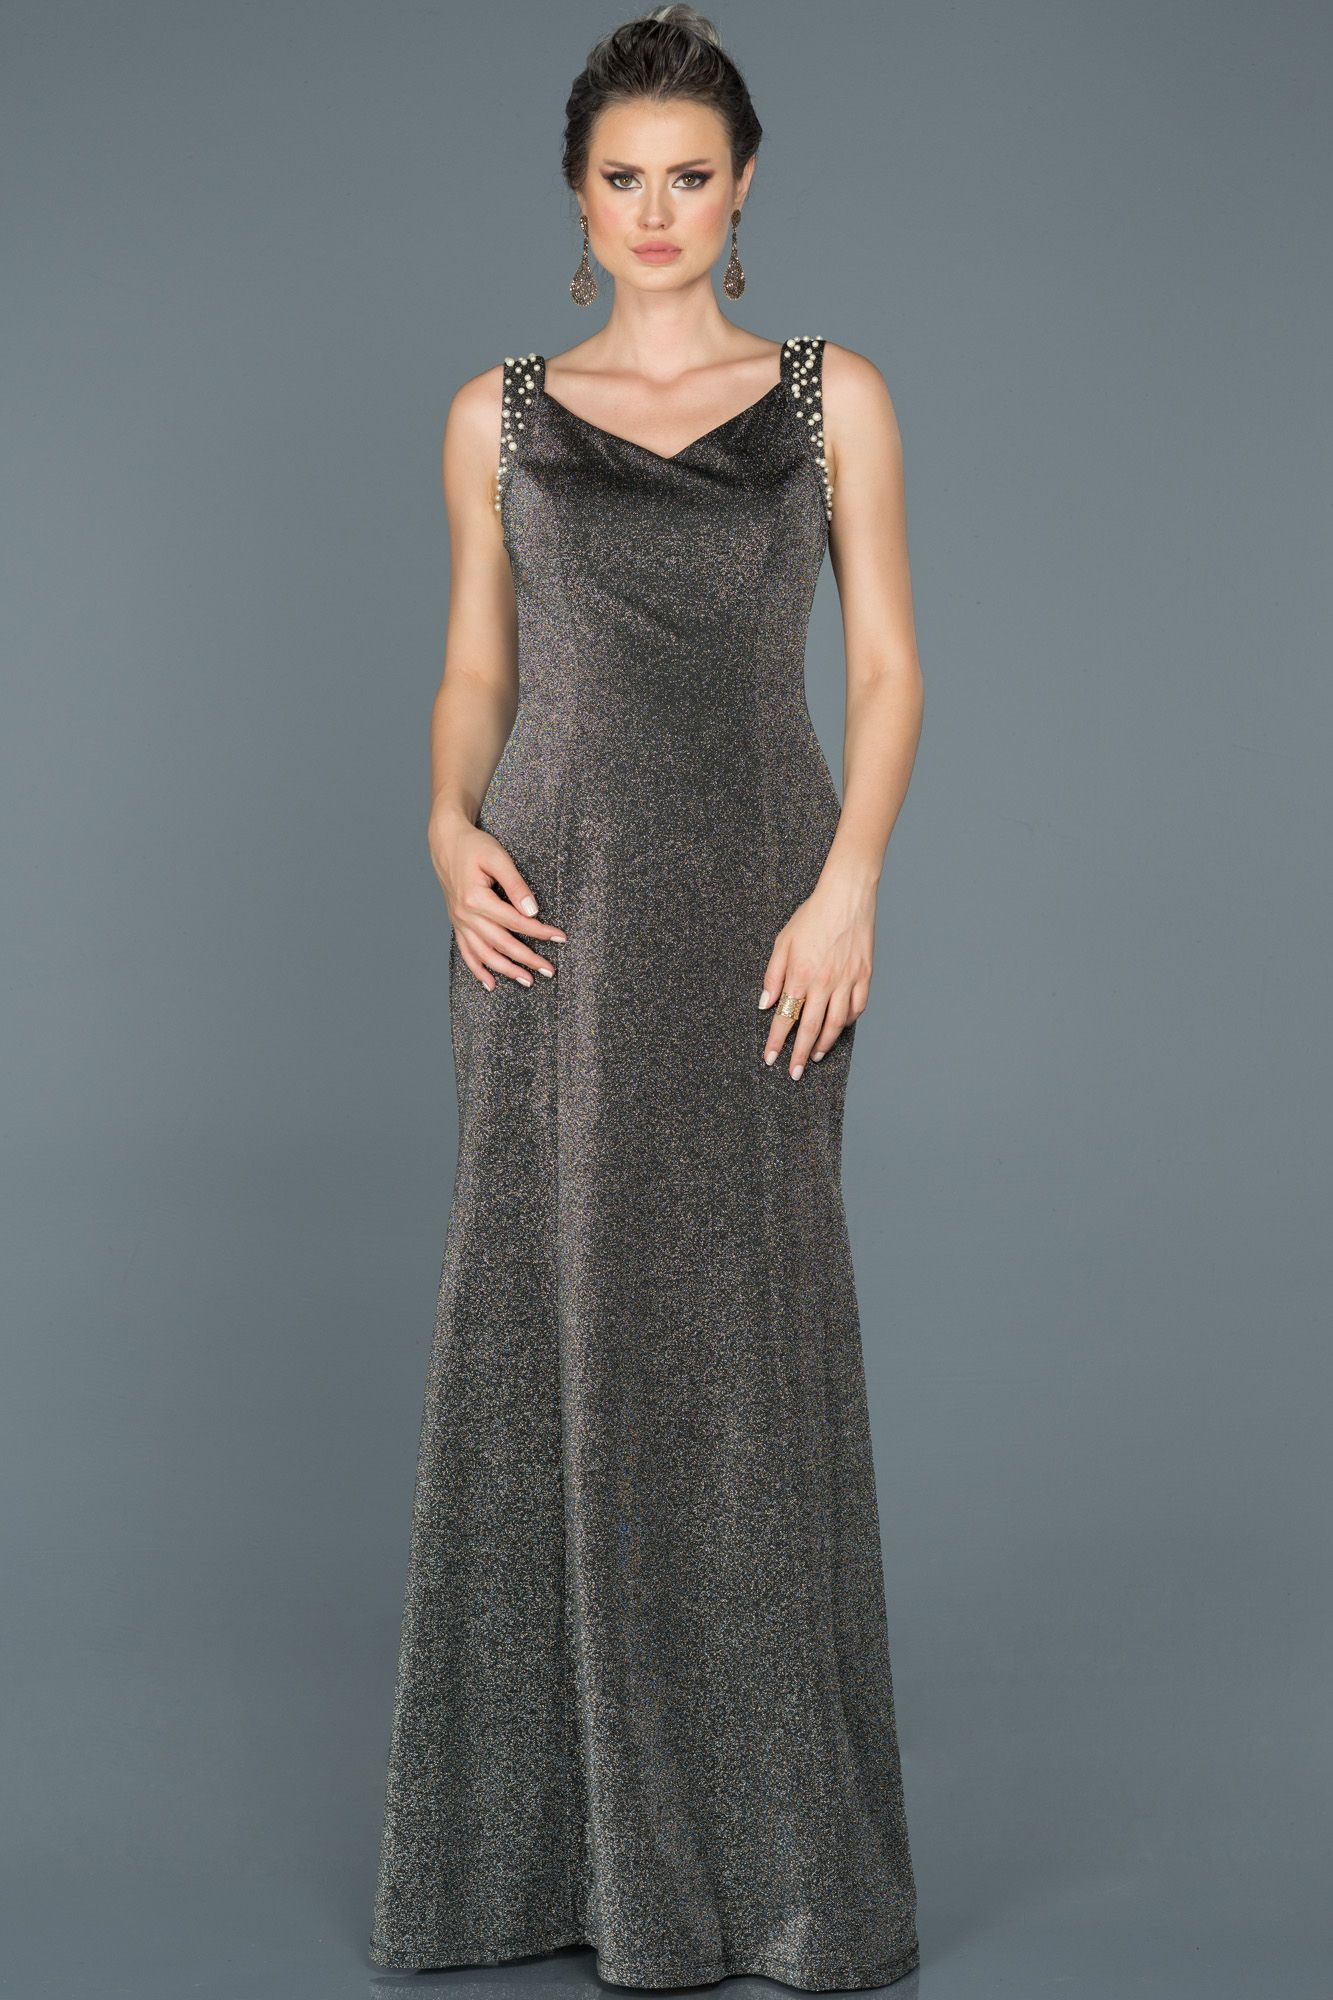 Siyah Kolsuz Simli Elbise Abu442 Elbise The Dress Elbise Modelleri